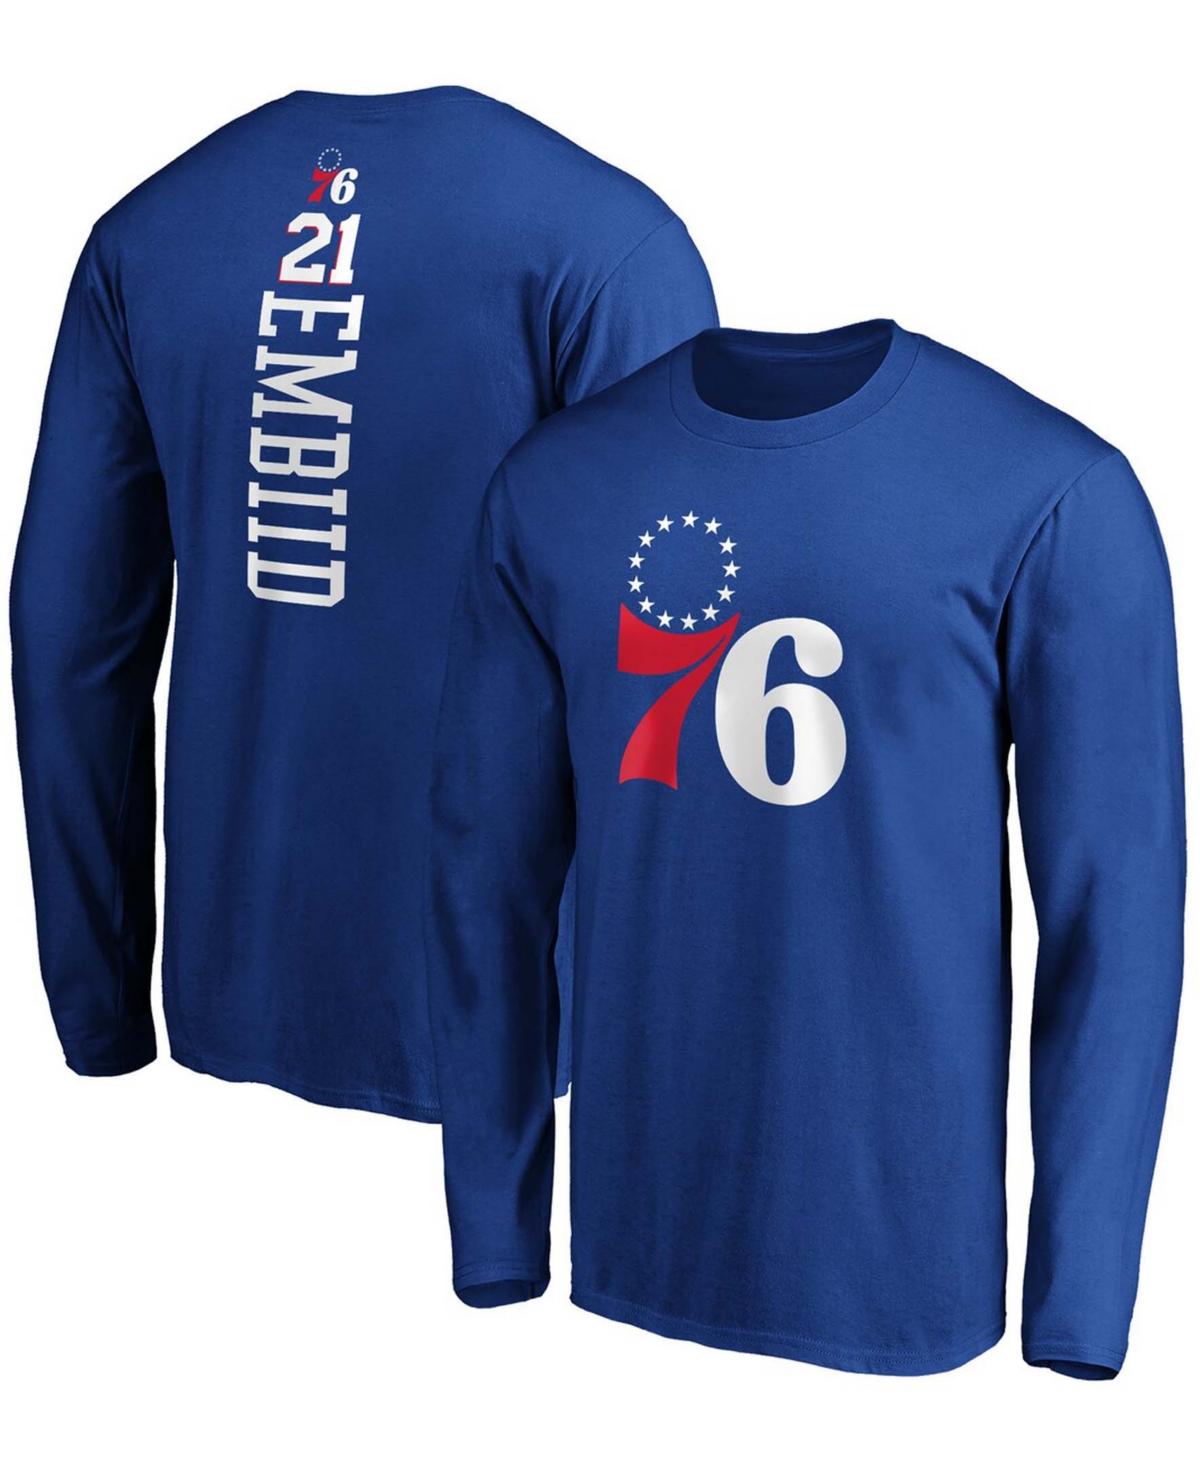 Men's Joel Embiid Royal Philadelphia 76ers Team Playmaker Name and Number Long Sleeve T-shirt